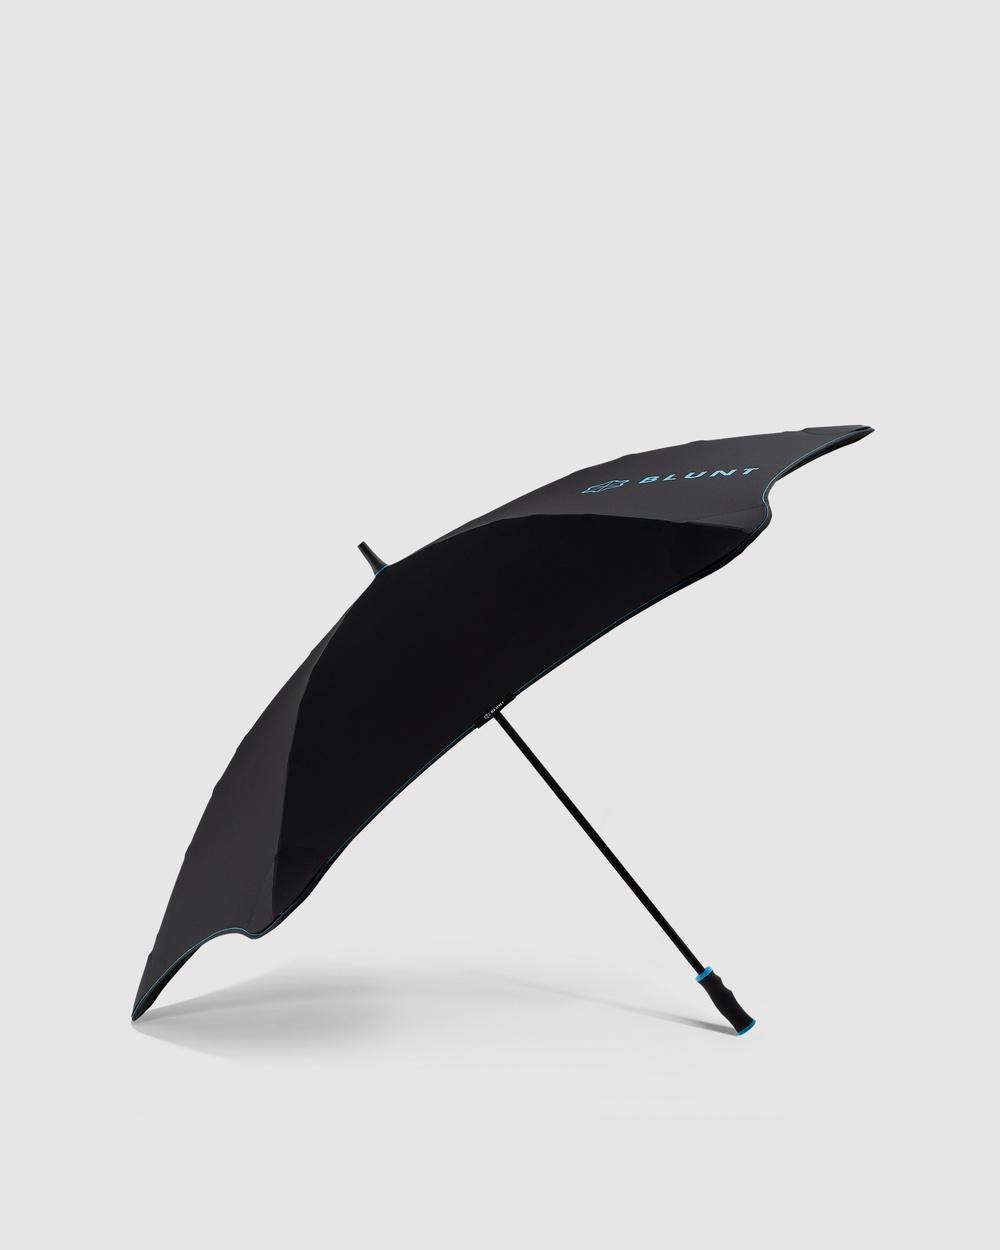 BLUNT Umbrellas Blunt Sport Umbrella Accessories Black Blue